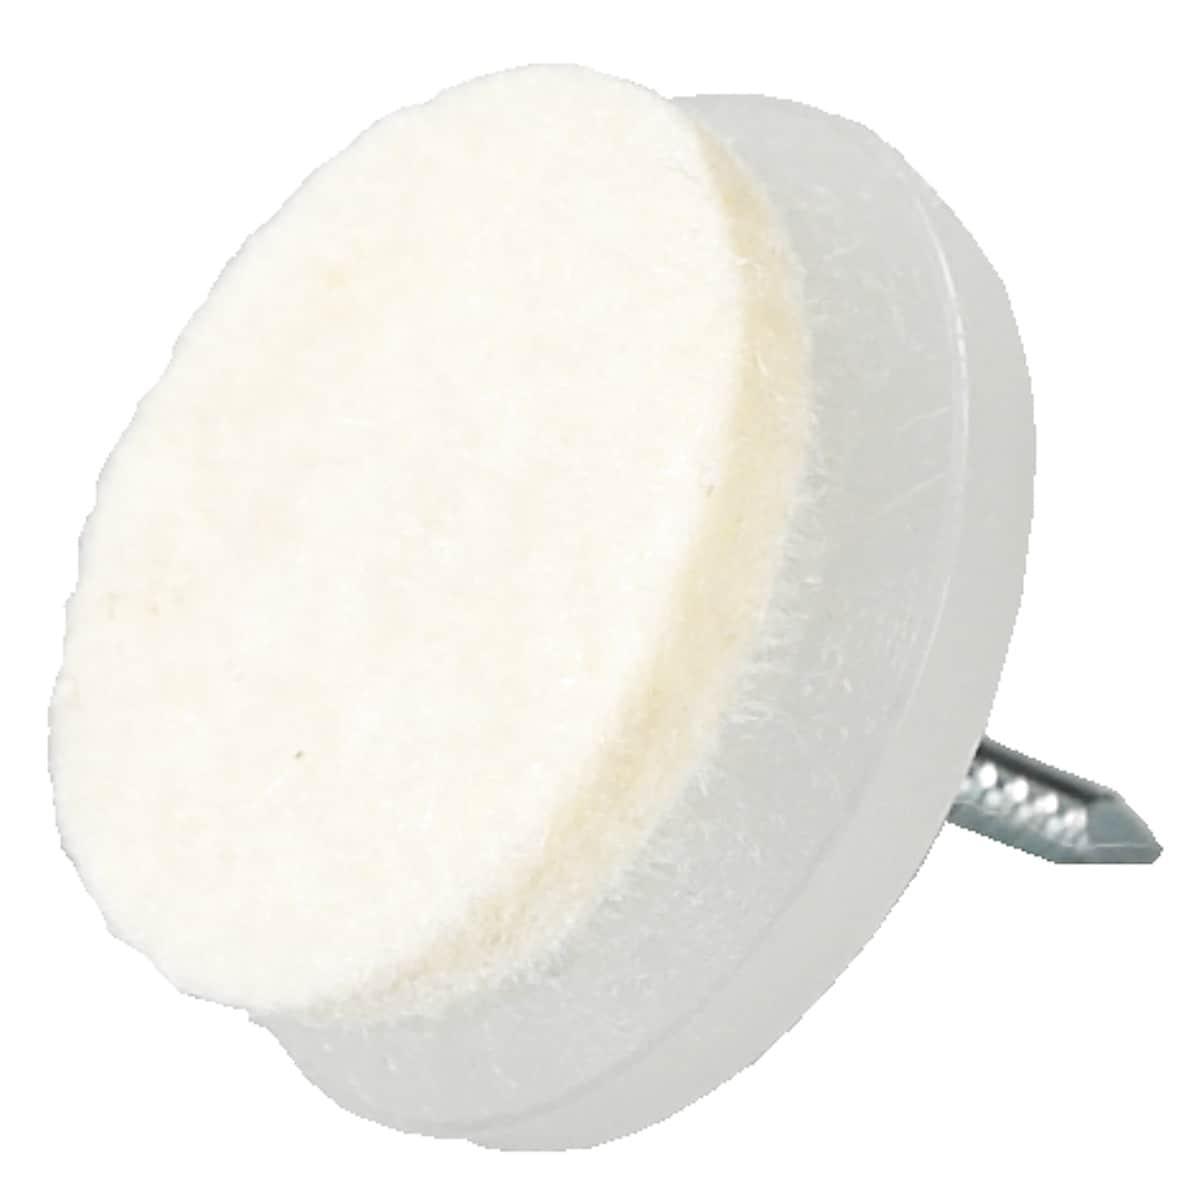 Møbelknotter filt/stift